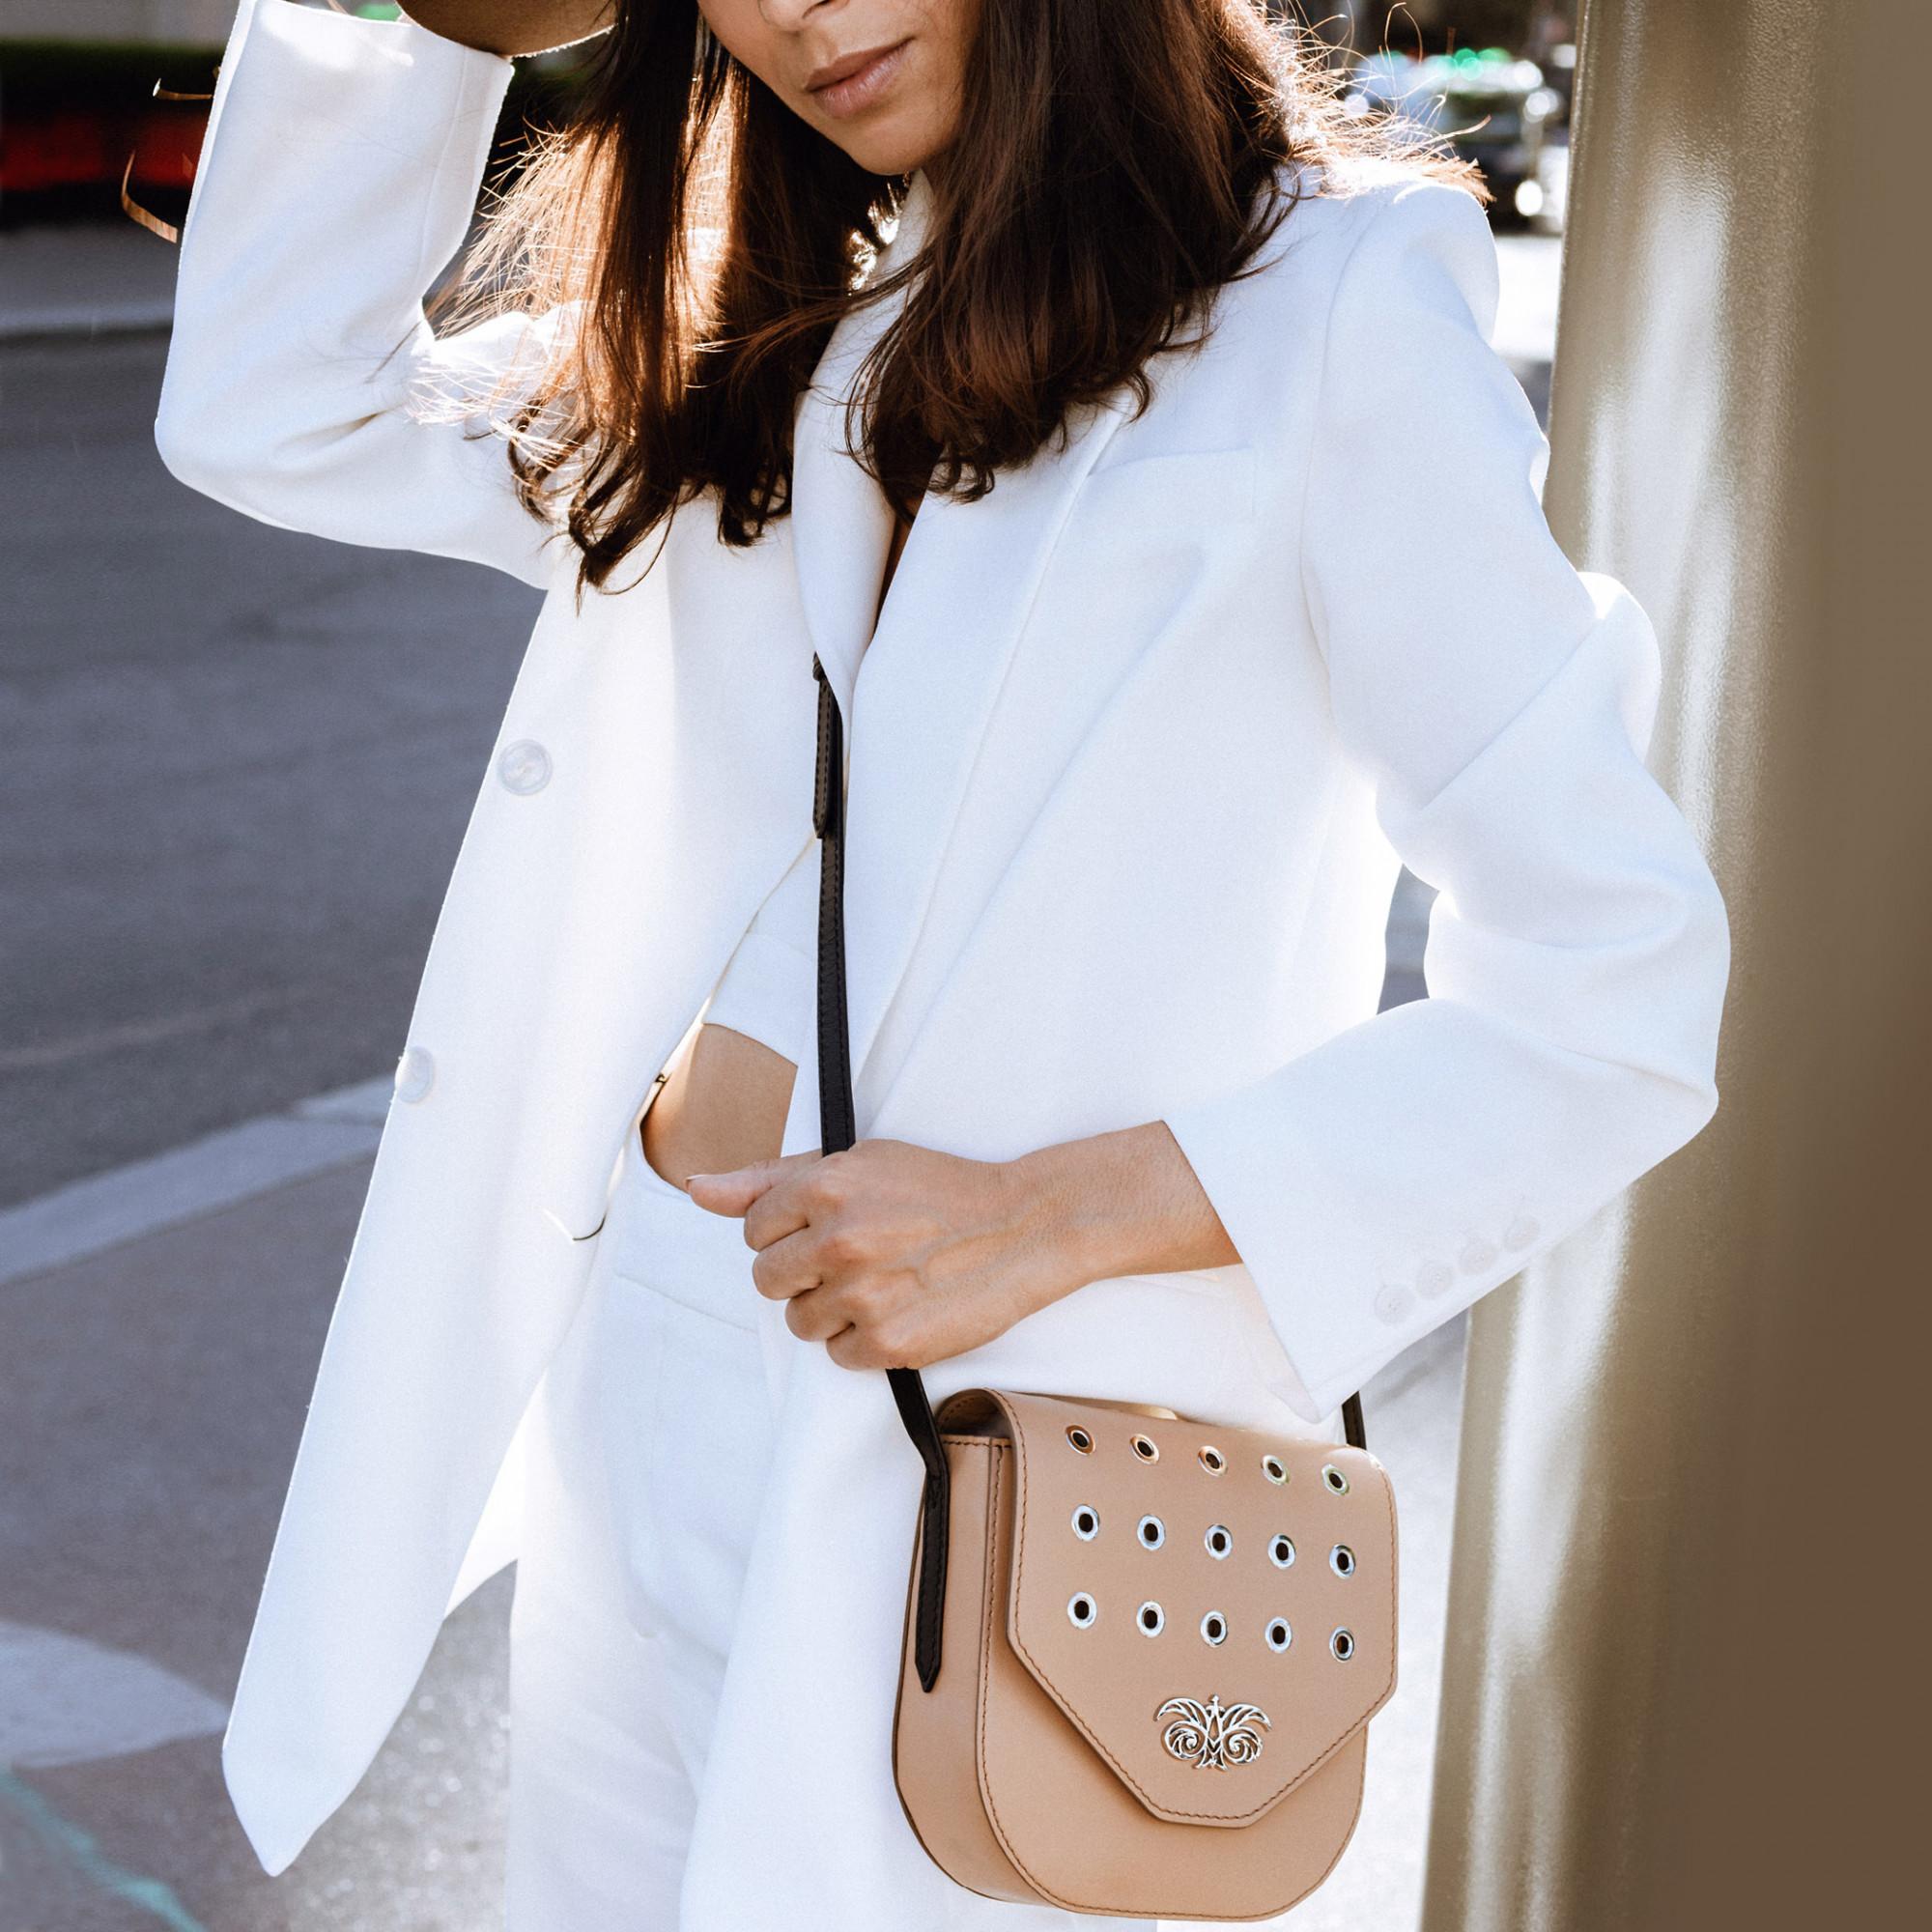 Small shoulder bag DINA ROCK in smooth leather, beige color - on a model